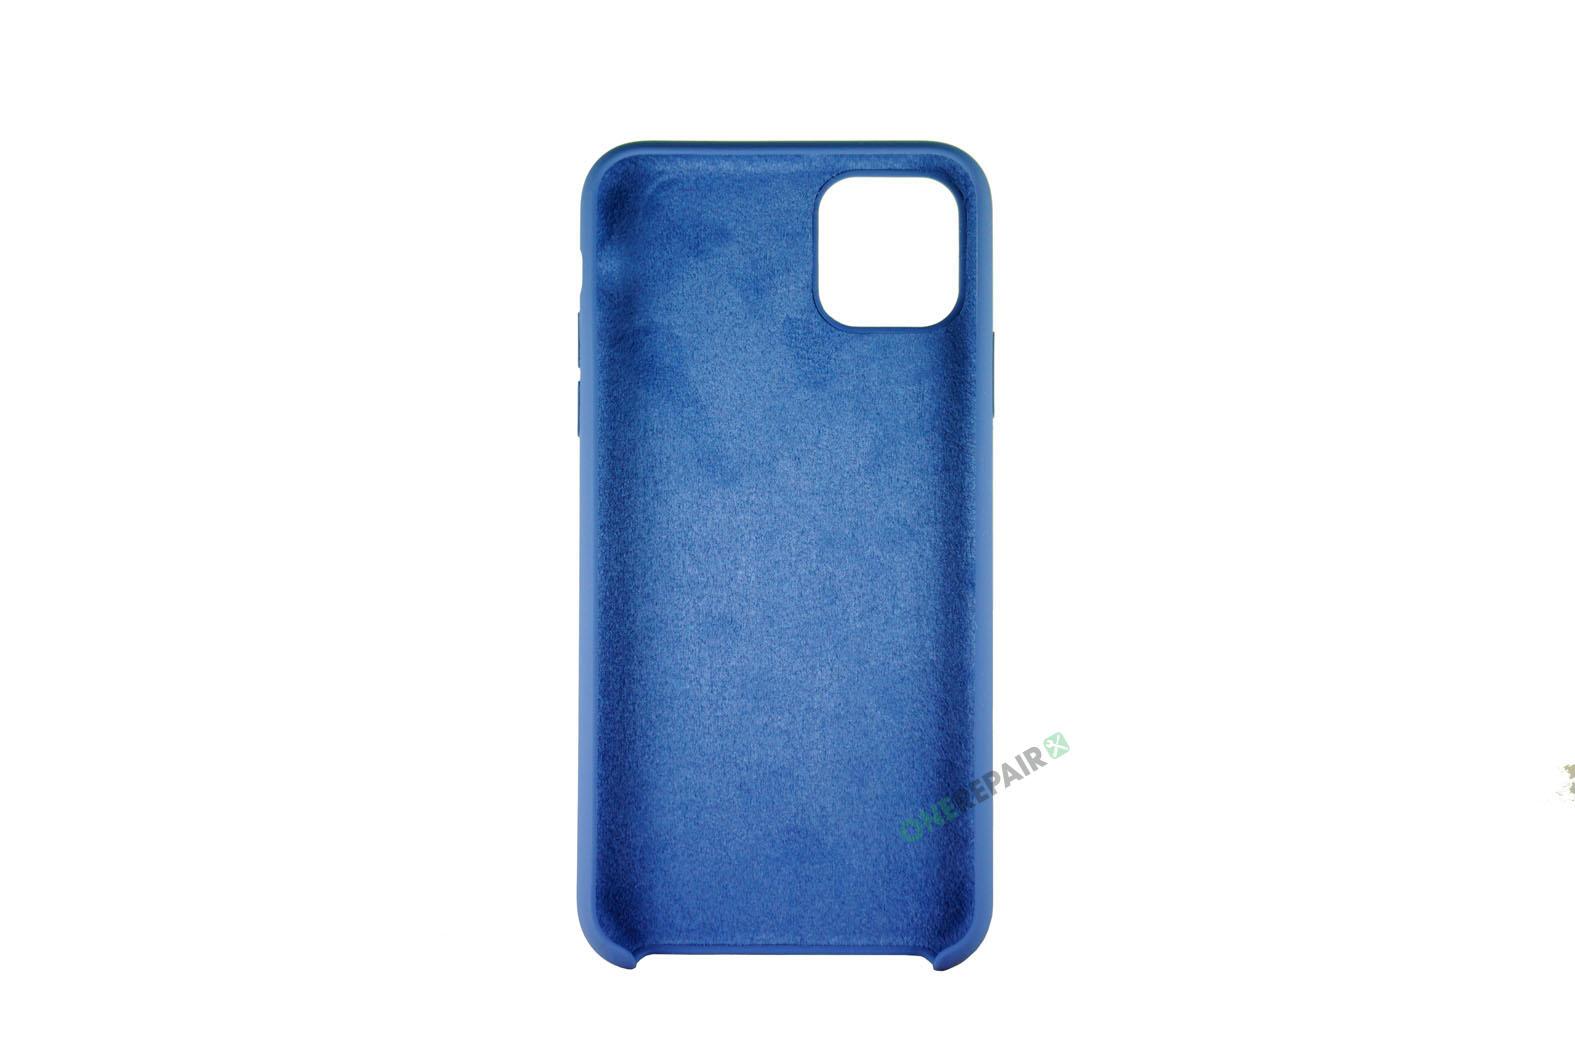 353777-003_iPhone_11_pro_Max_silikone_cover_blaa_onerepair_00002